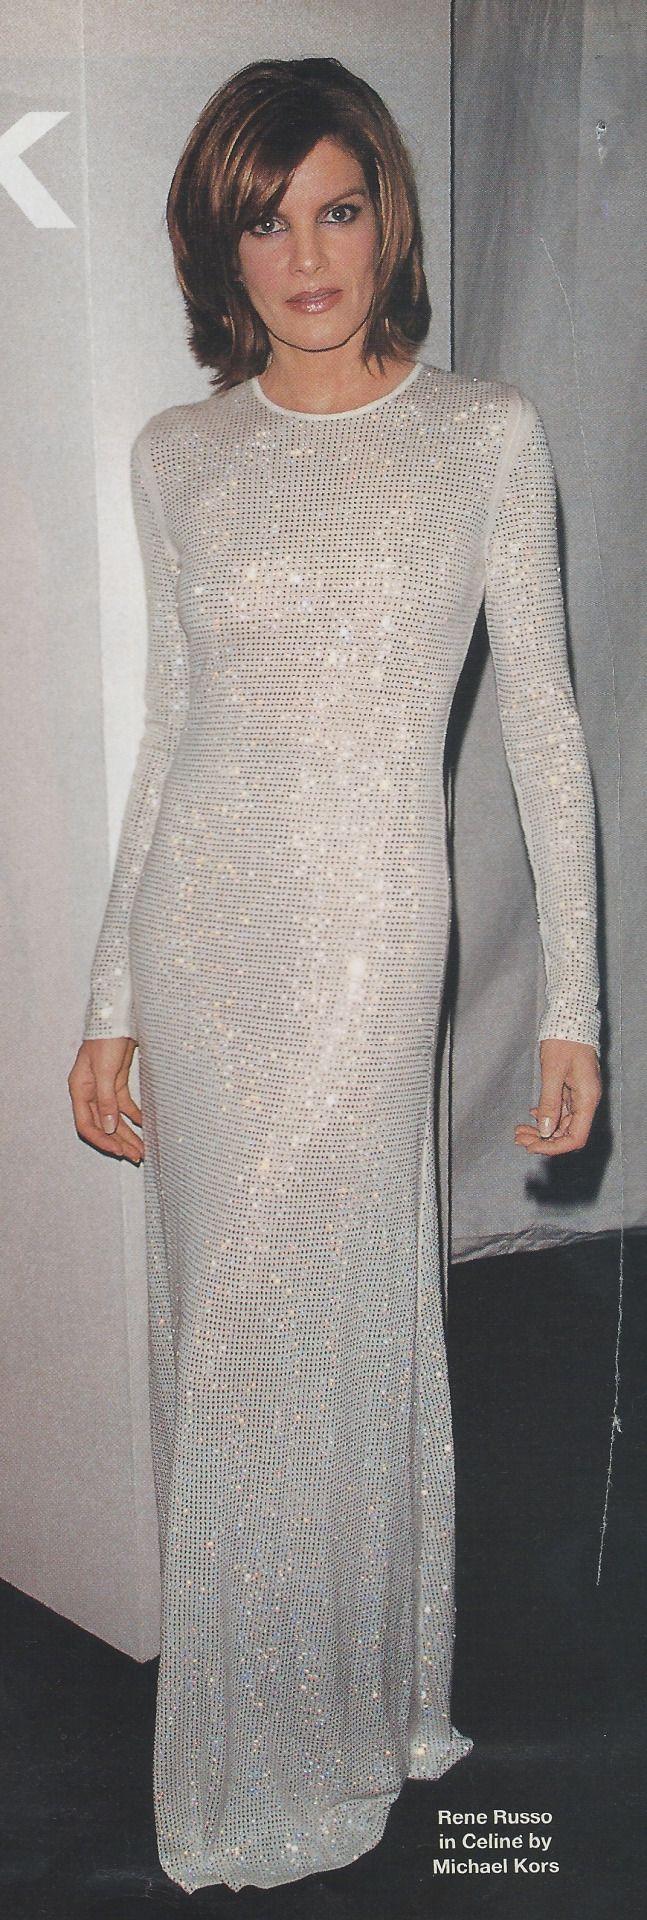 Rene Russo in Céline by Michael Kors, 1999 aka my future wedding dress